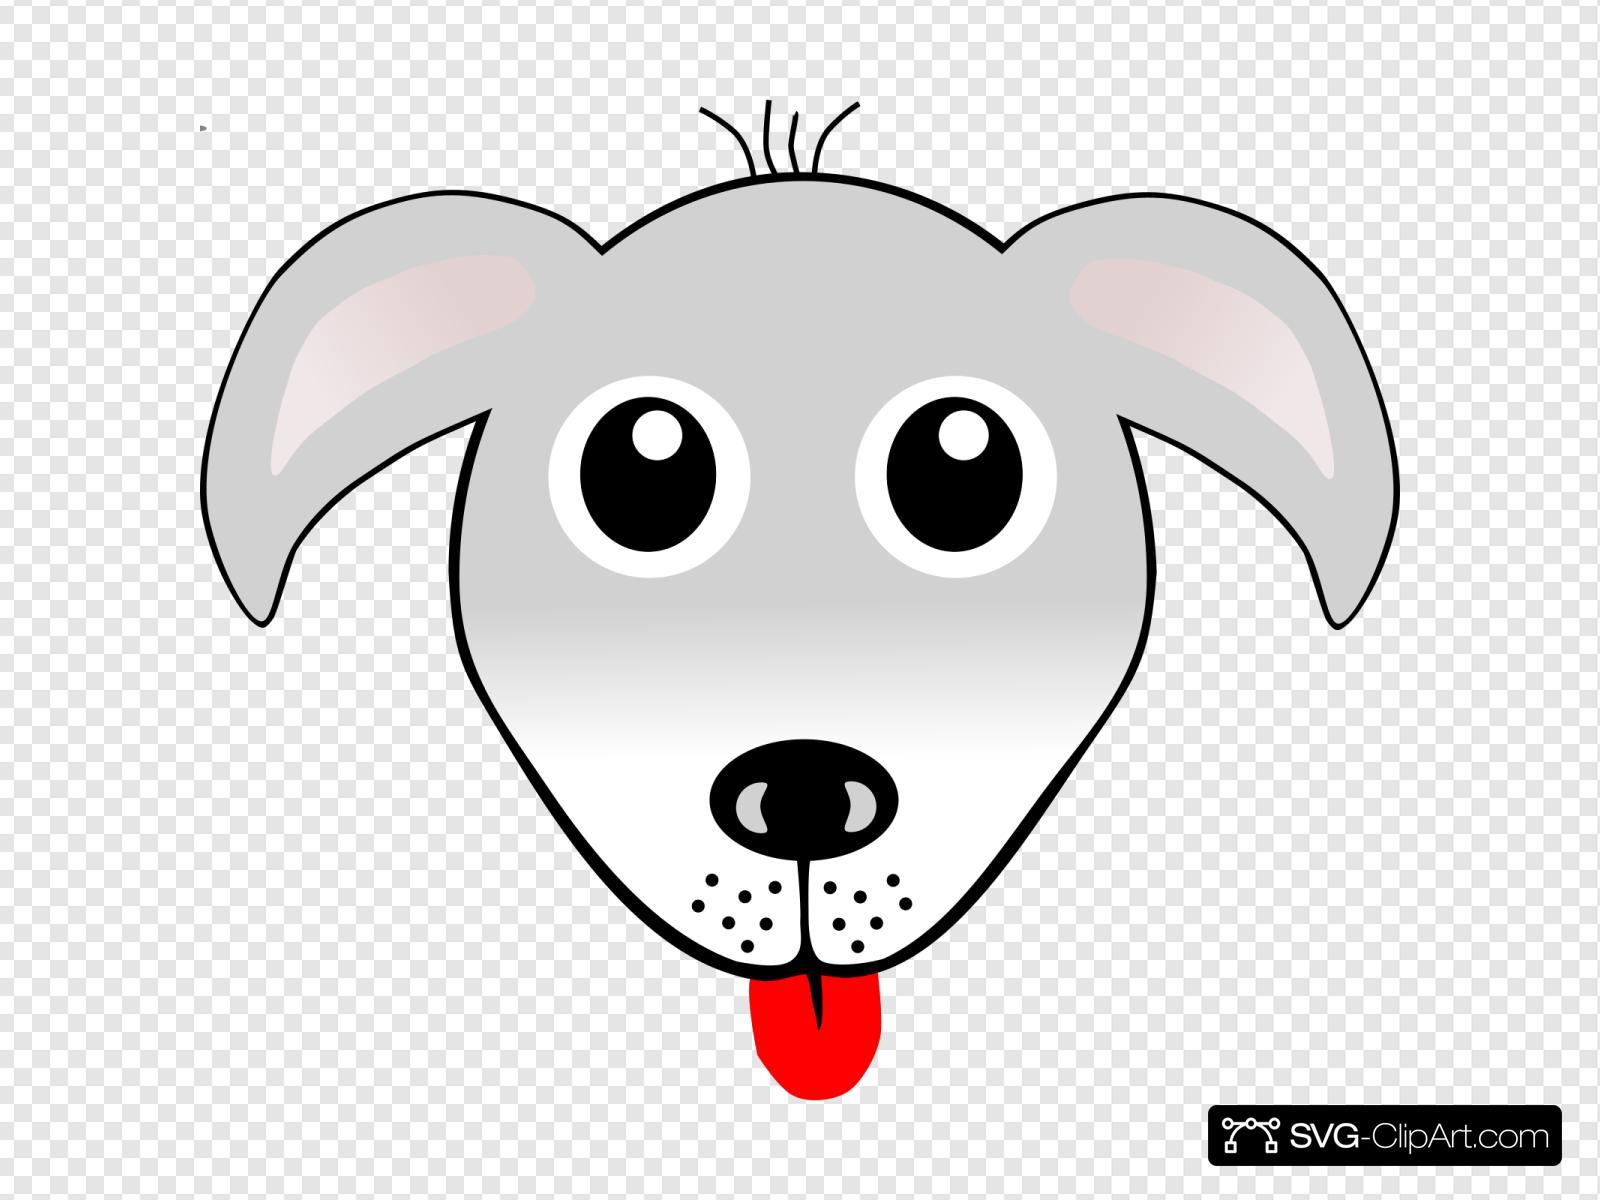 Dog Face Svg Vector Dog Face Clip Art Svg Clipart